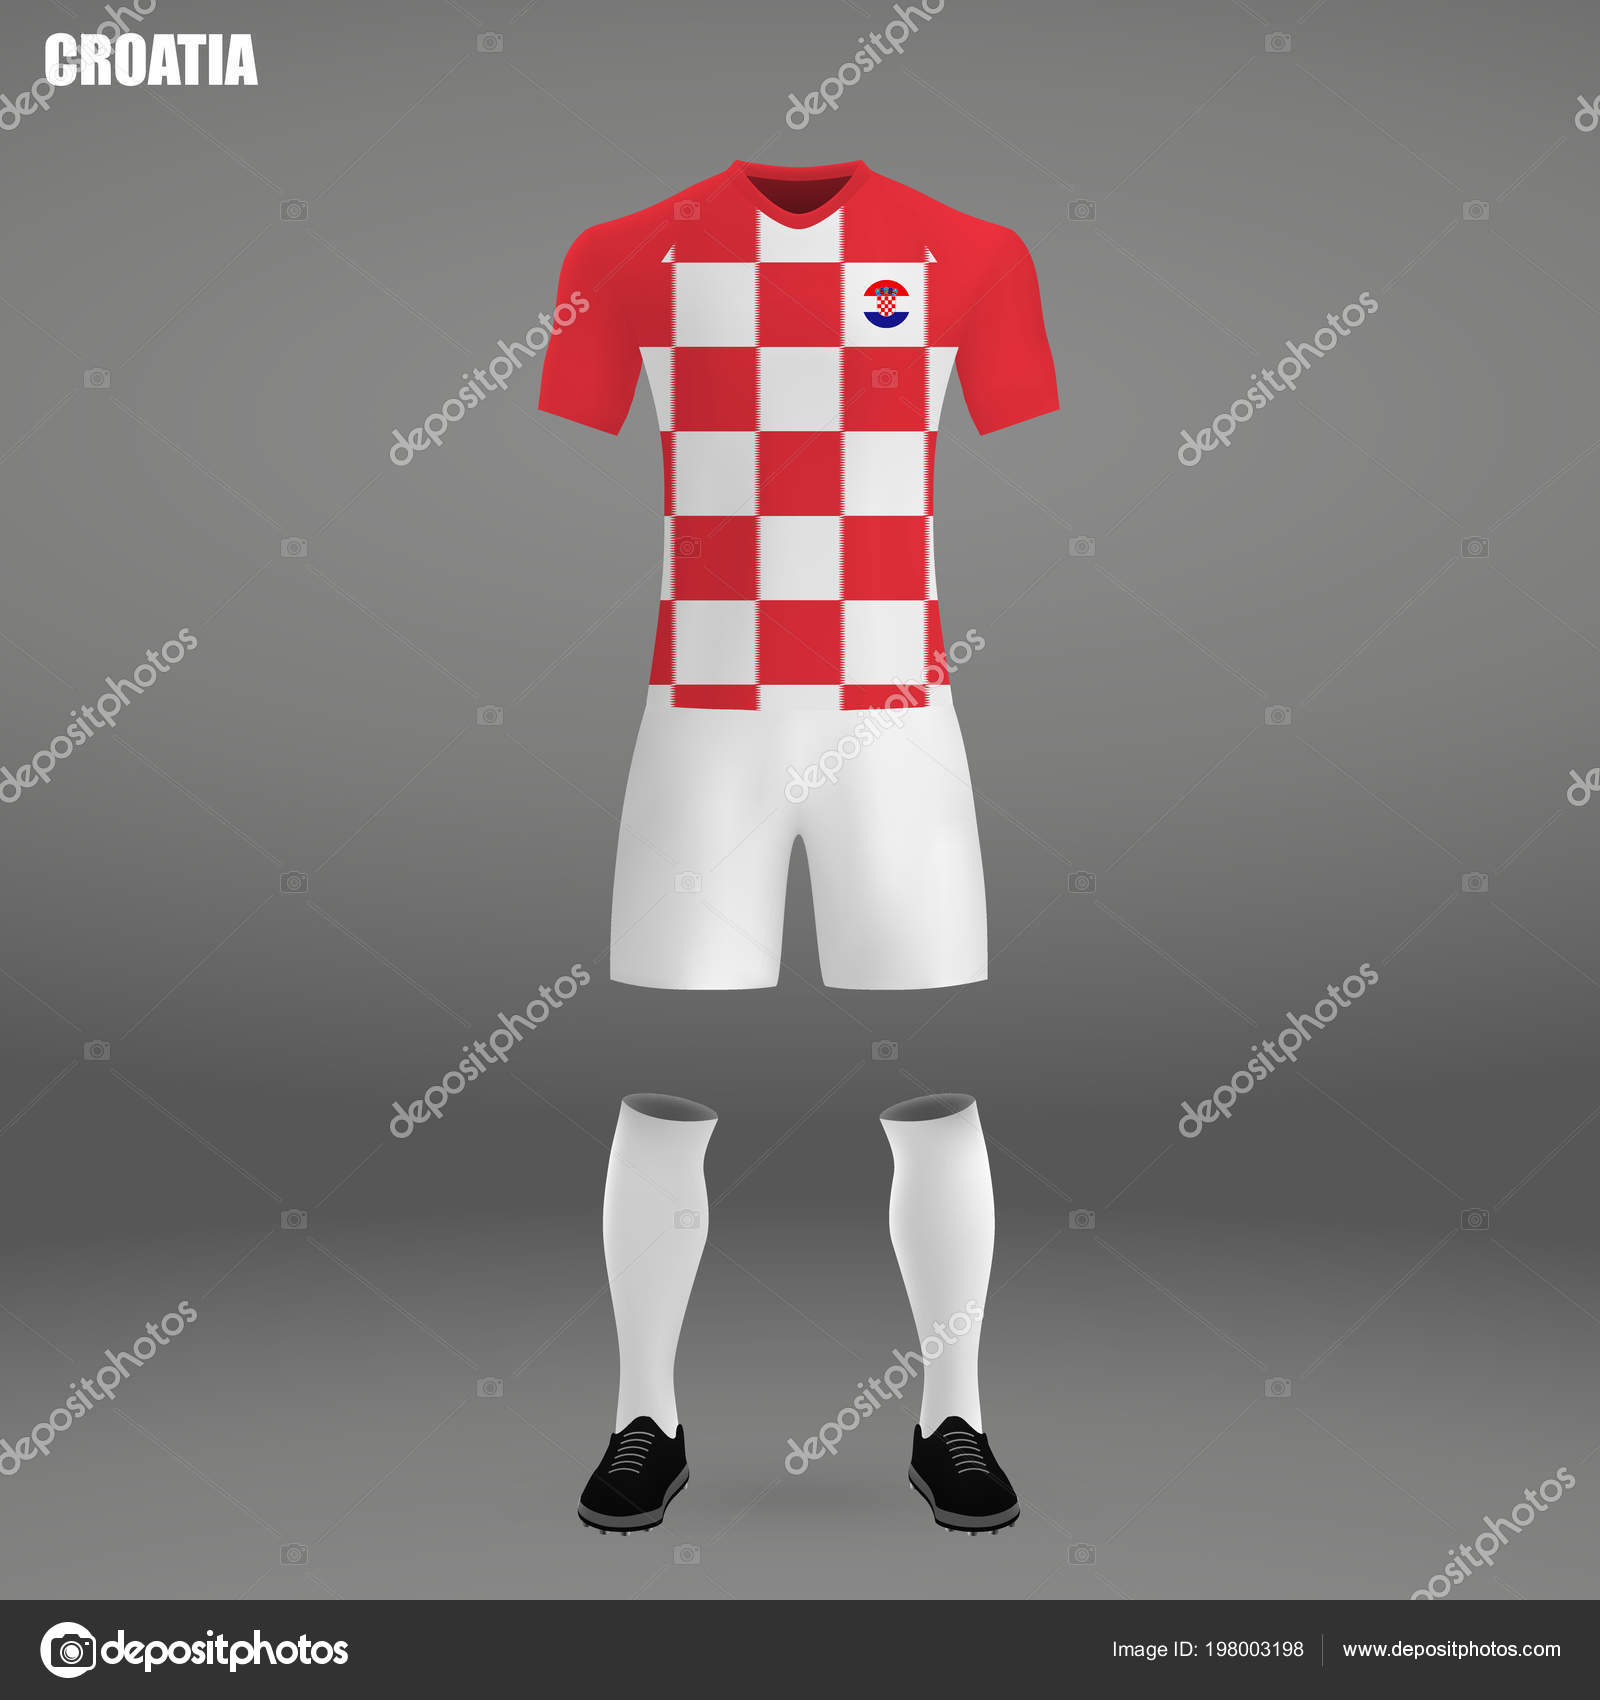 299f3626f0c Football Kit Croatia 2018 Shirt Template Soccer Jersey Vector Illustration  — Stock Vector